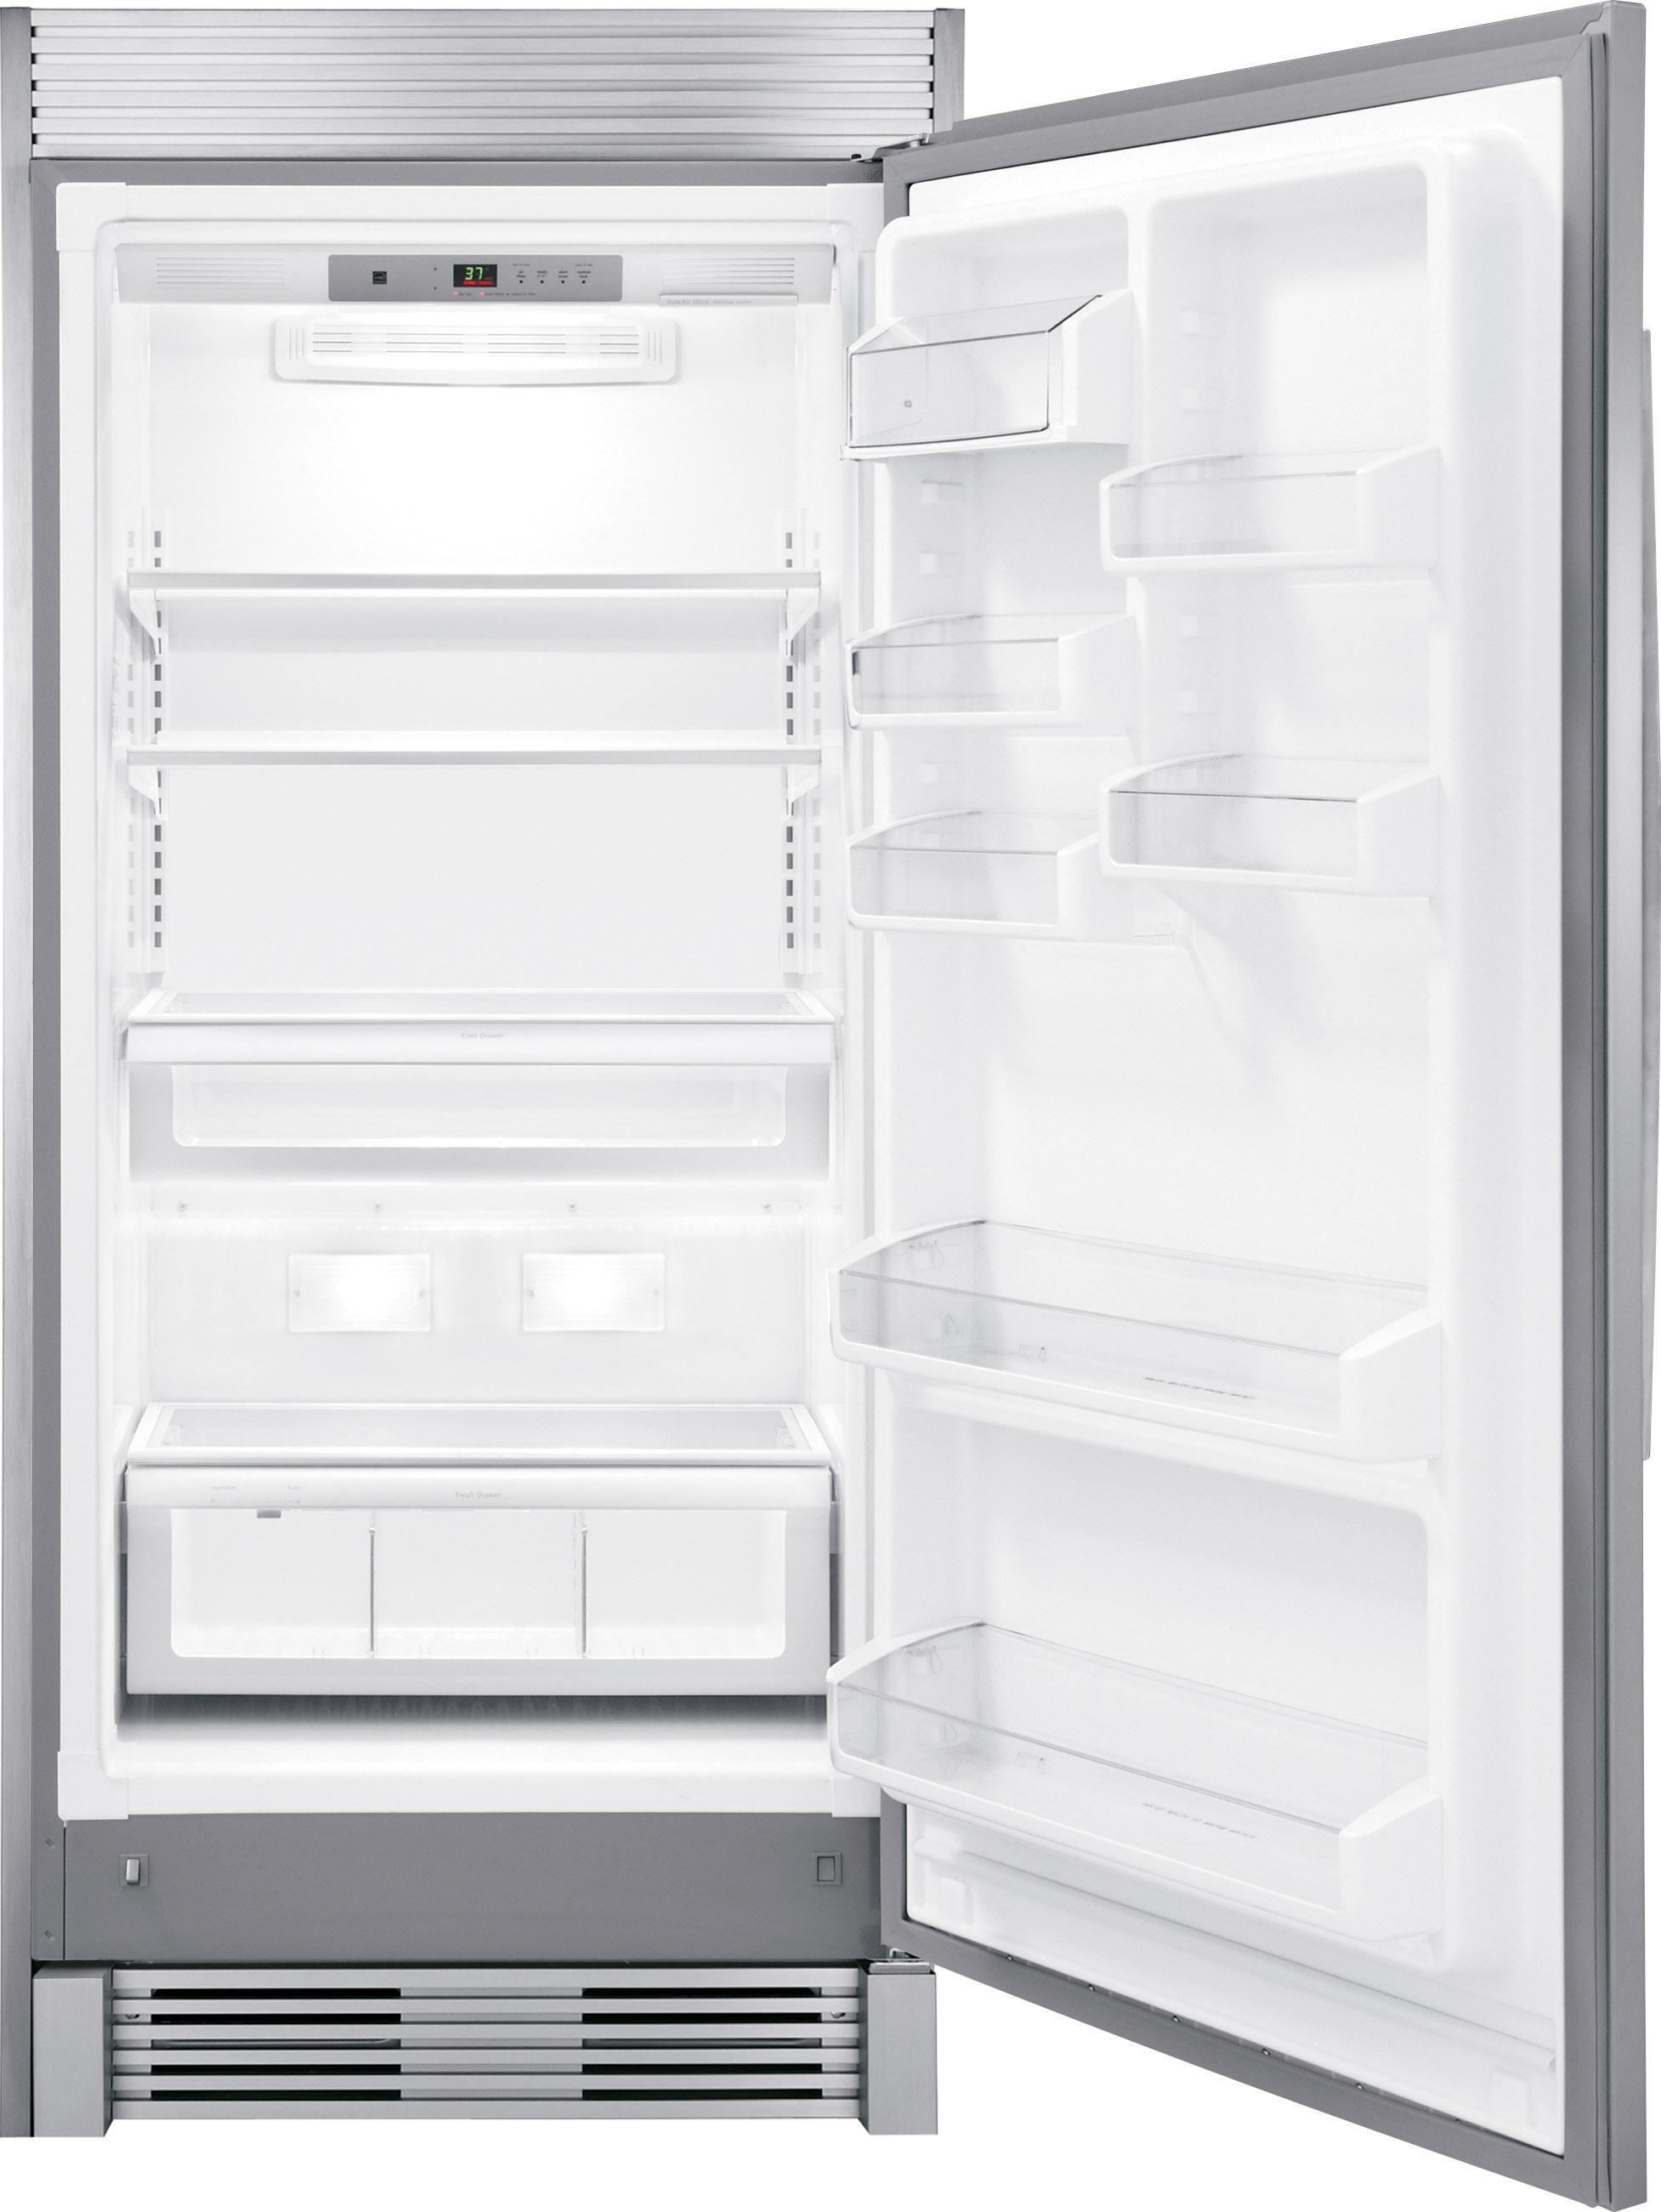 Frigidaire Gallery Frigidaire Gallery FGRU19F6QF 19 Cu. Ft. Freezerless  Refrigerator   Stainless Steel 2